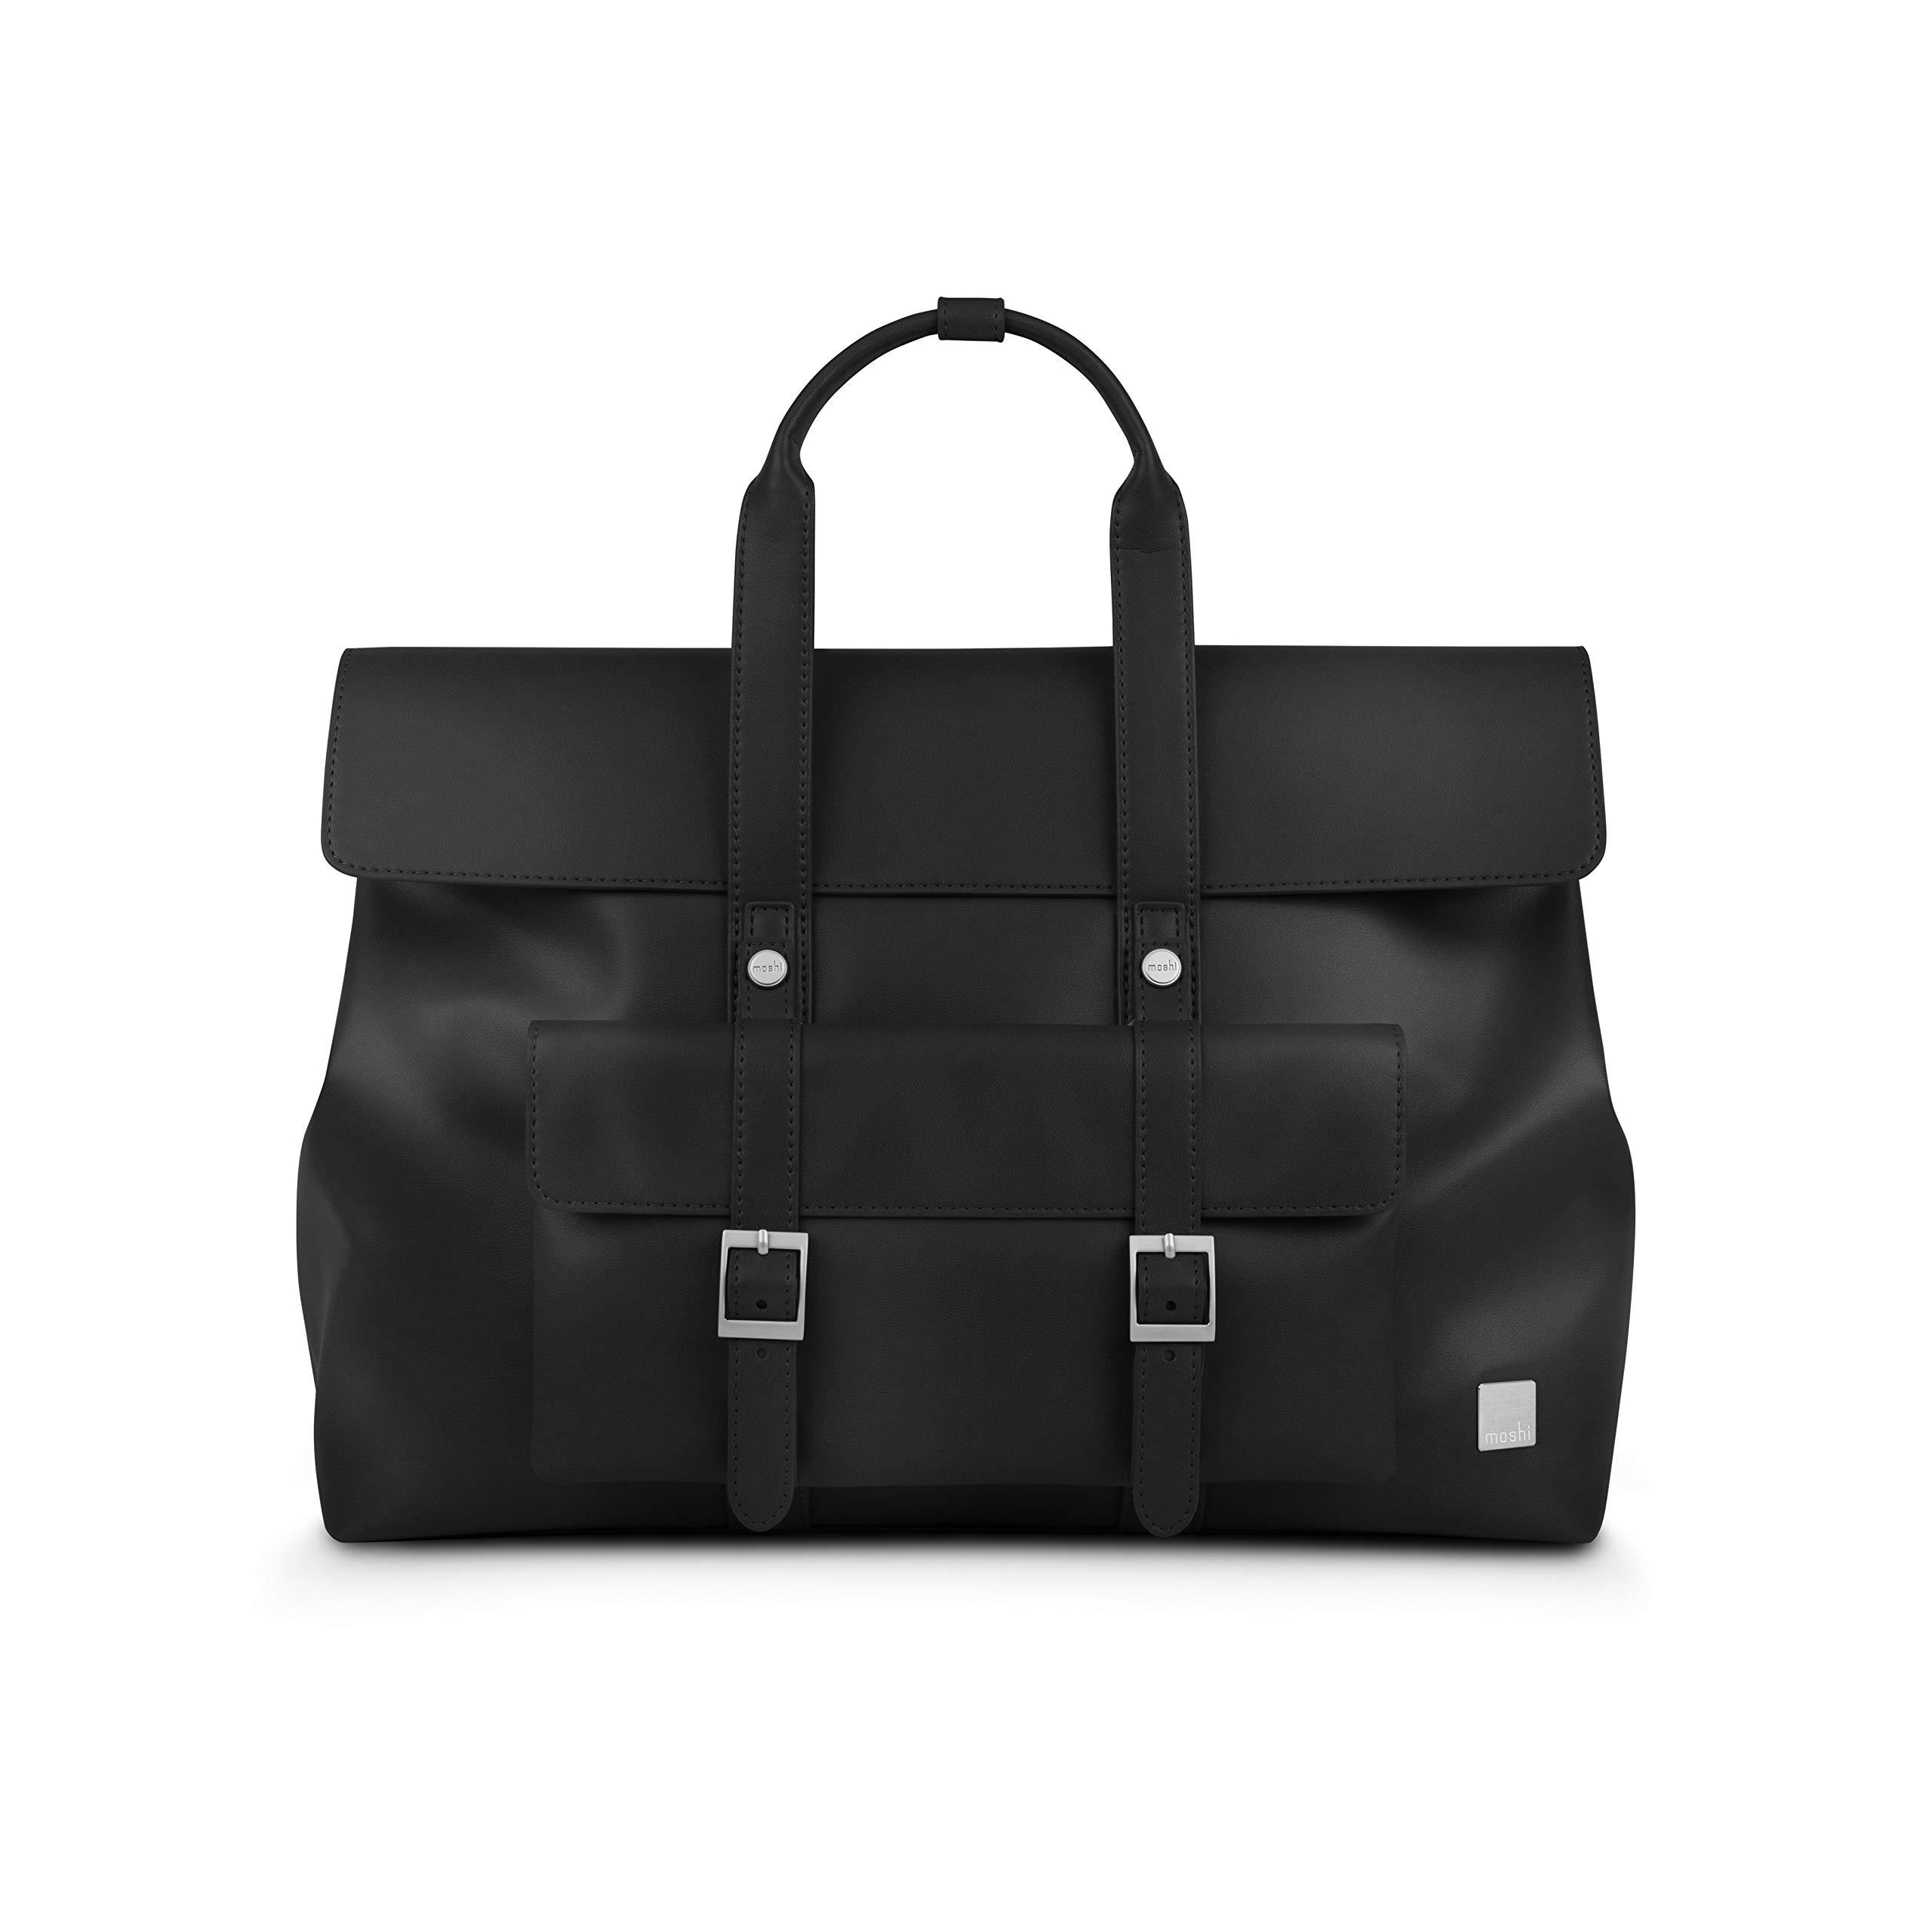 "Moshi Treya lite 13"" Notebook Laptop Briefcase Backpack, MacBook Satchel, Premium Vegan Leather Bag - Black"